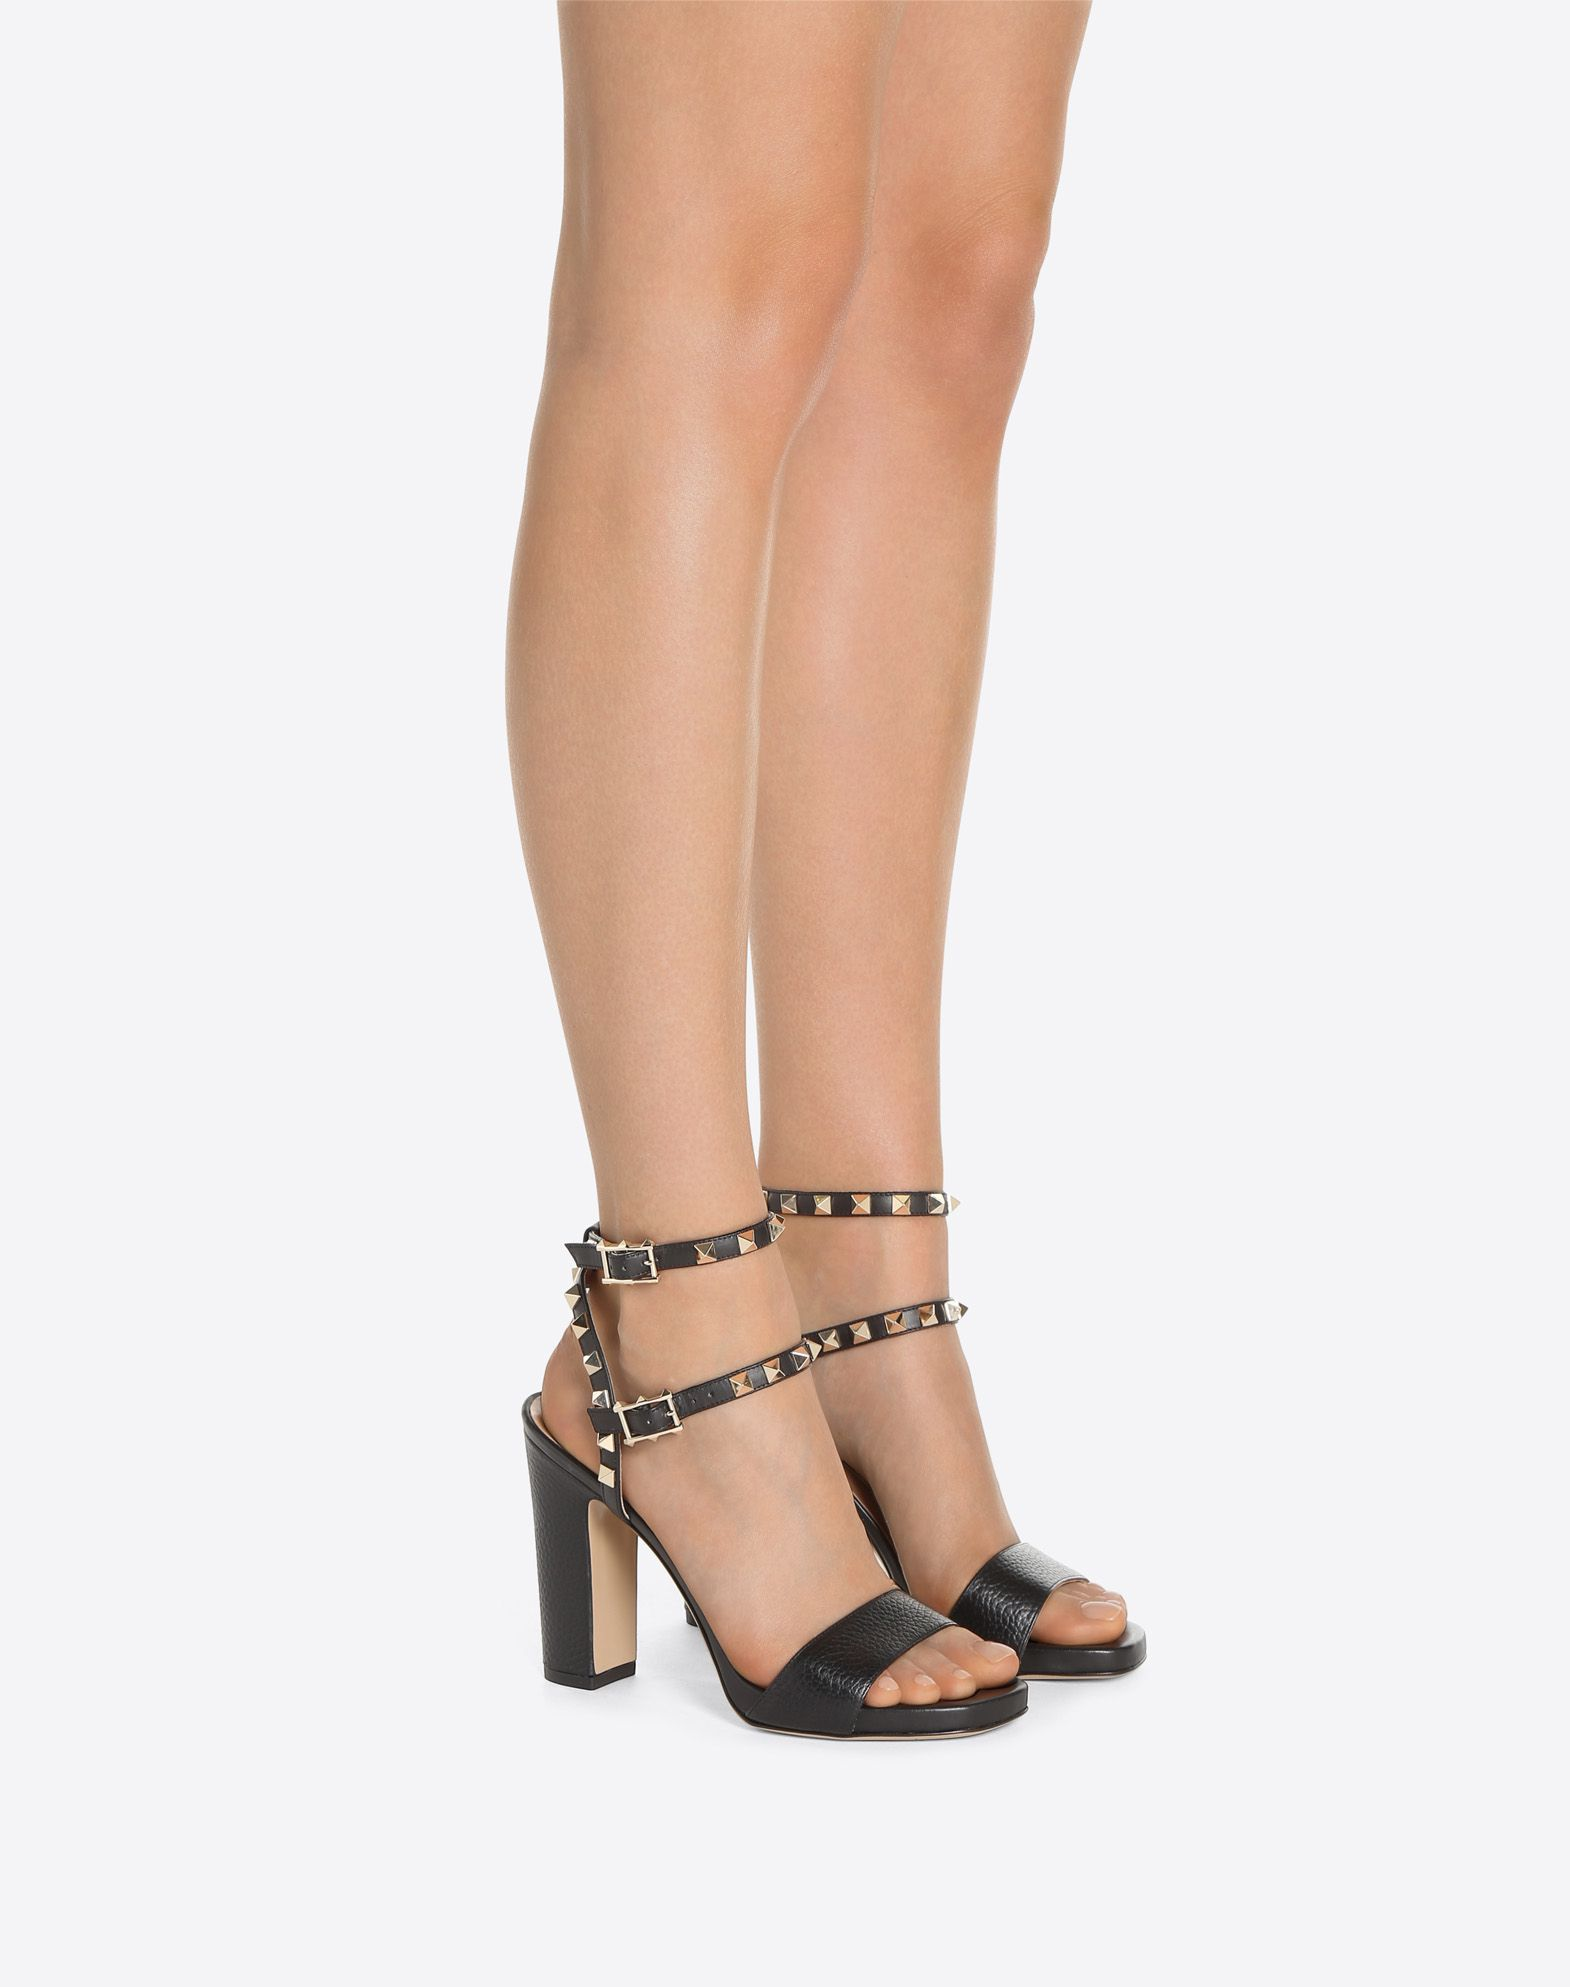 VALENTINO GARAVANI Rockstud Sandal HIGH HEEL SANDALS D a